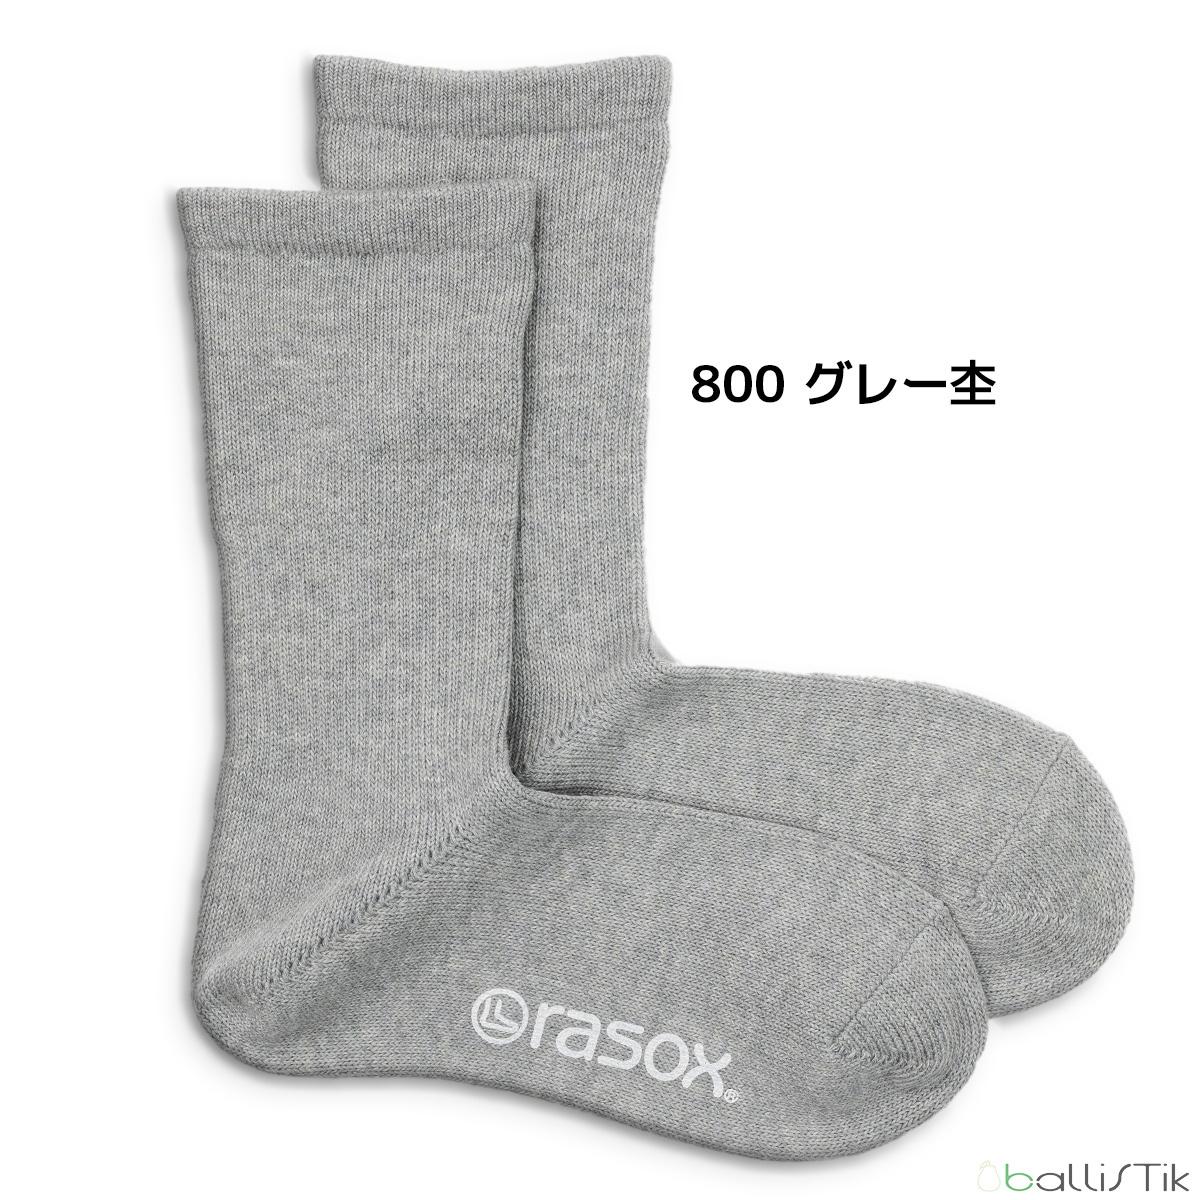 rasox/ラソックス/靴下/クルーソックス/ベーシック/カラー2